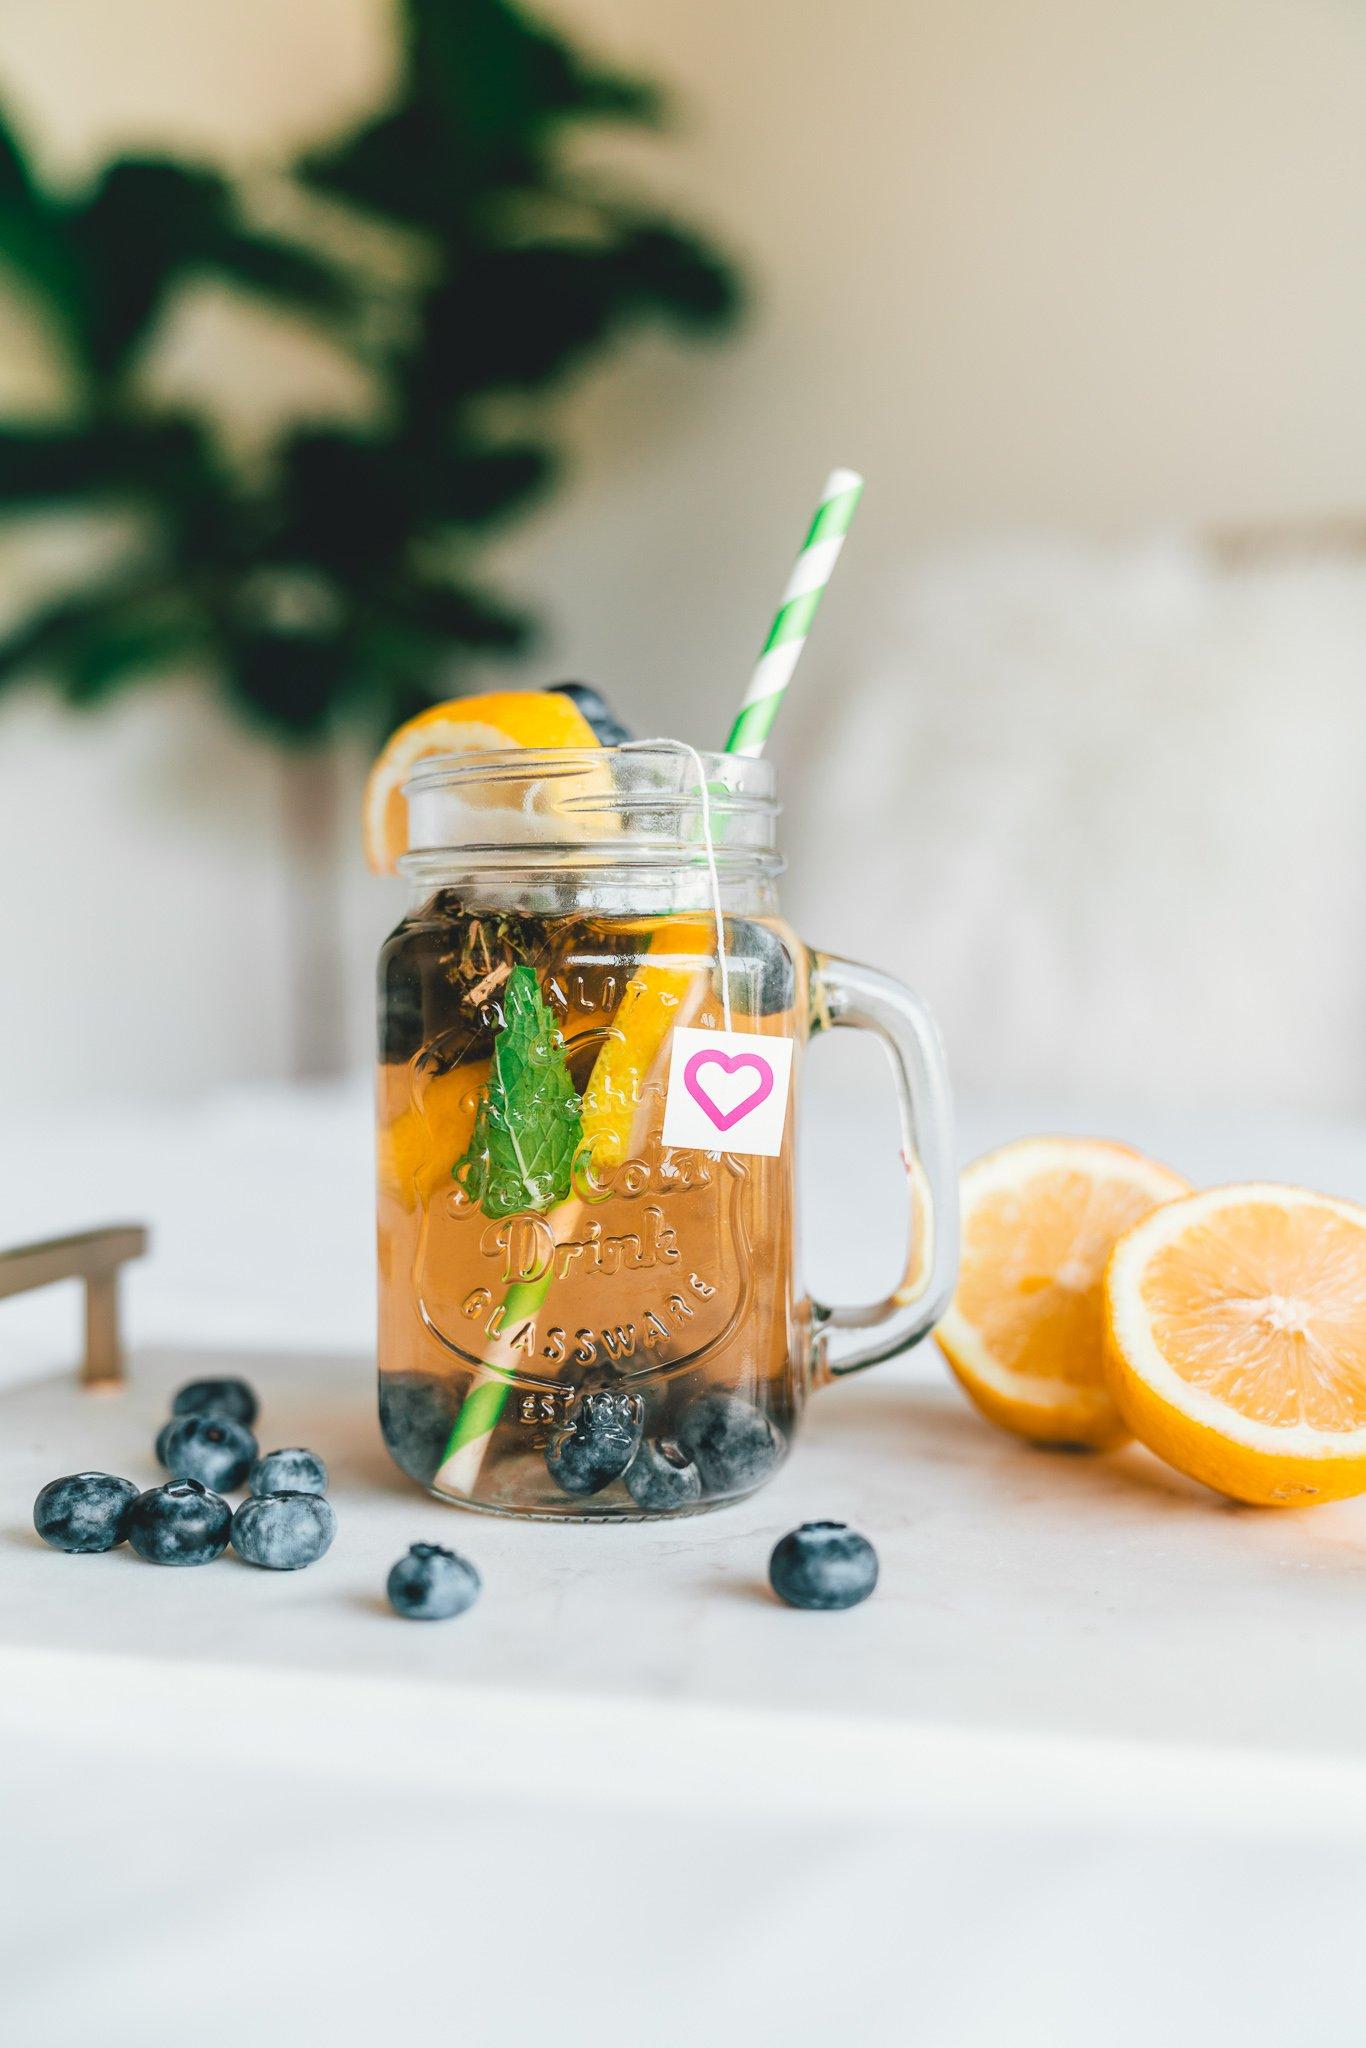 apple cider vinegar recipes - Blueberry Apple Cider Vinegar Detox Recipe